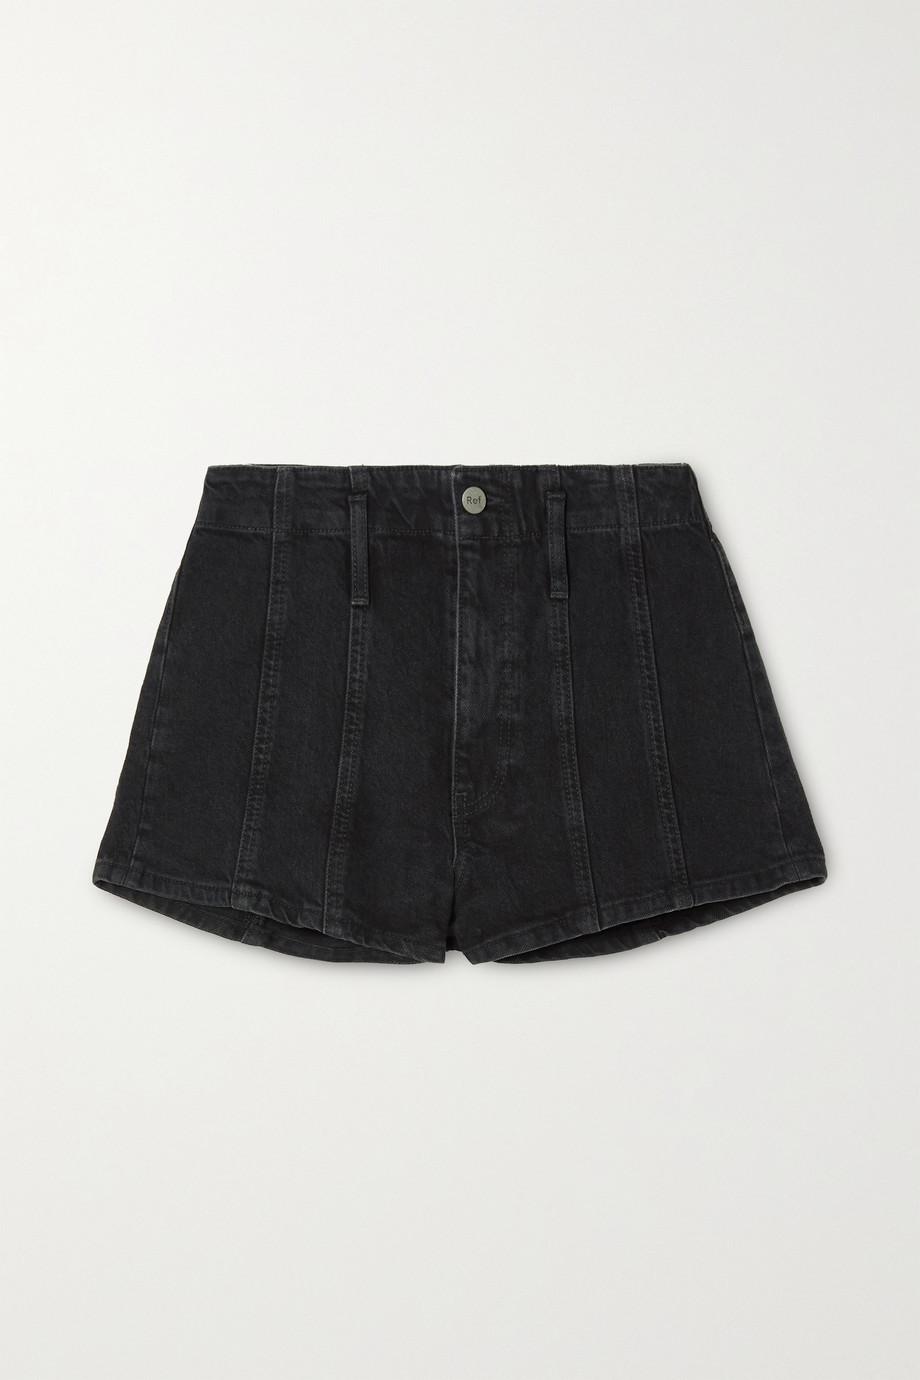 Reformation + NET SUSTAIN Eva organic denim shorts